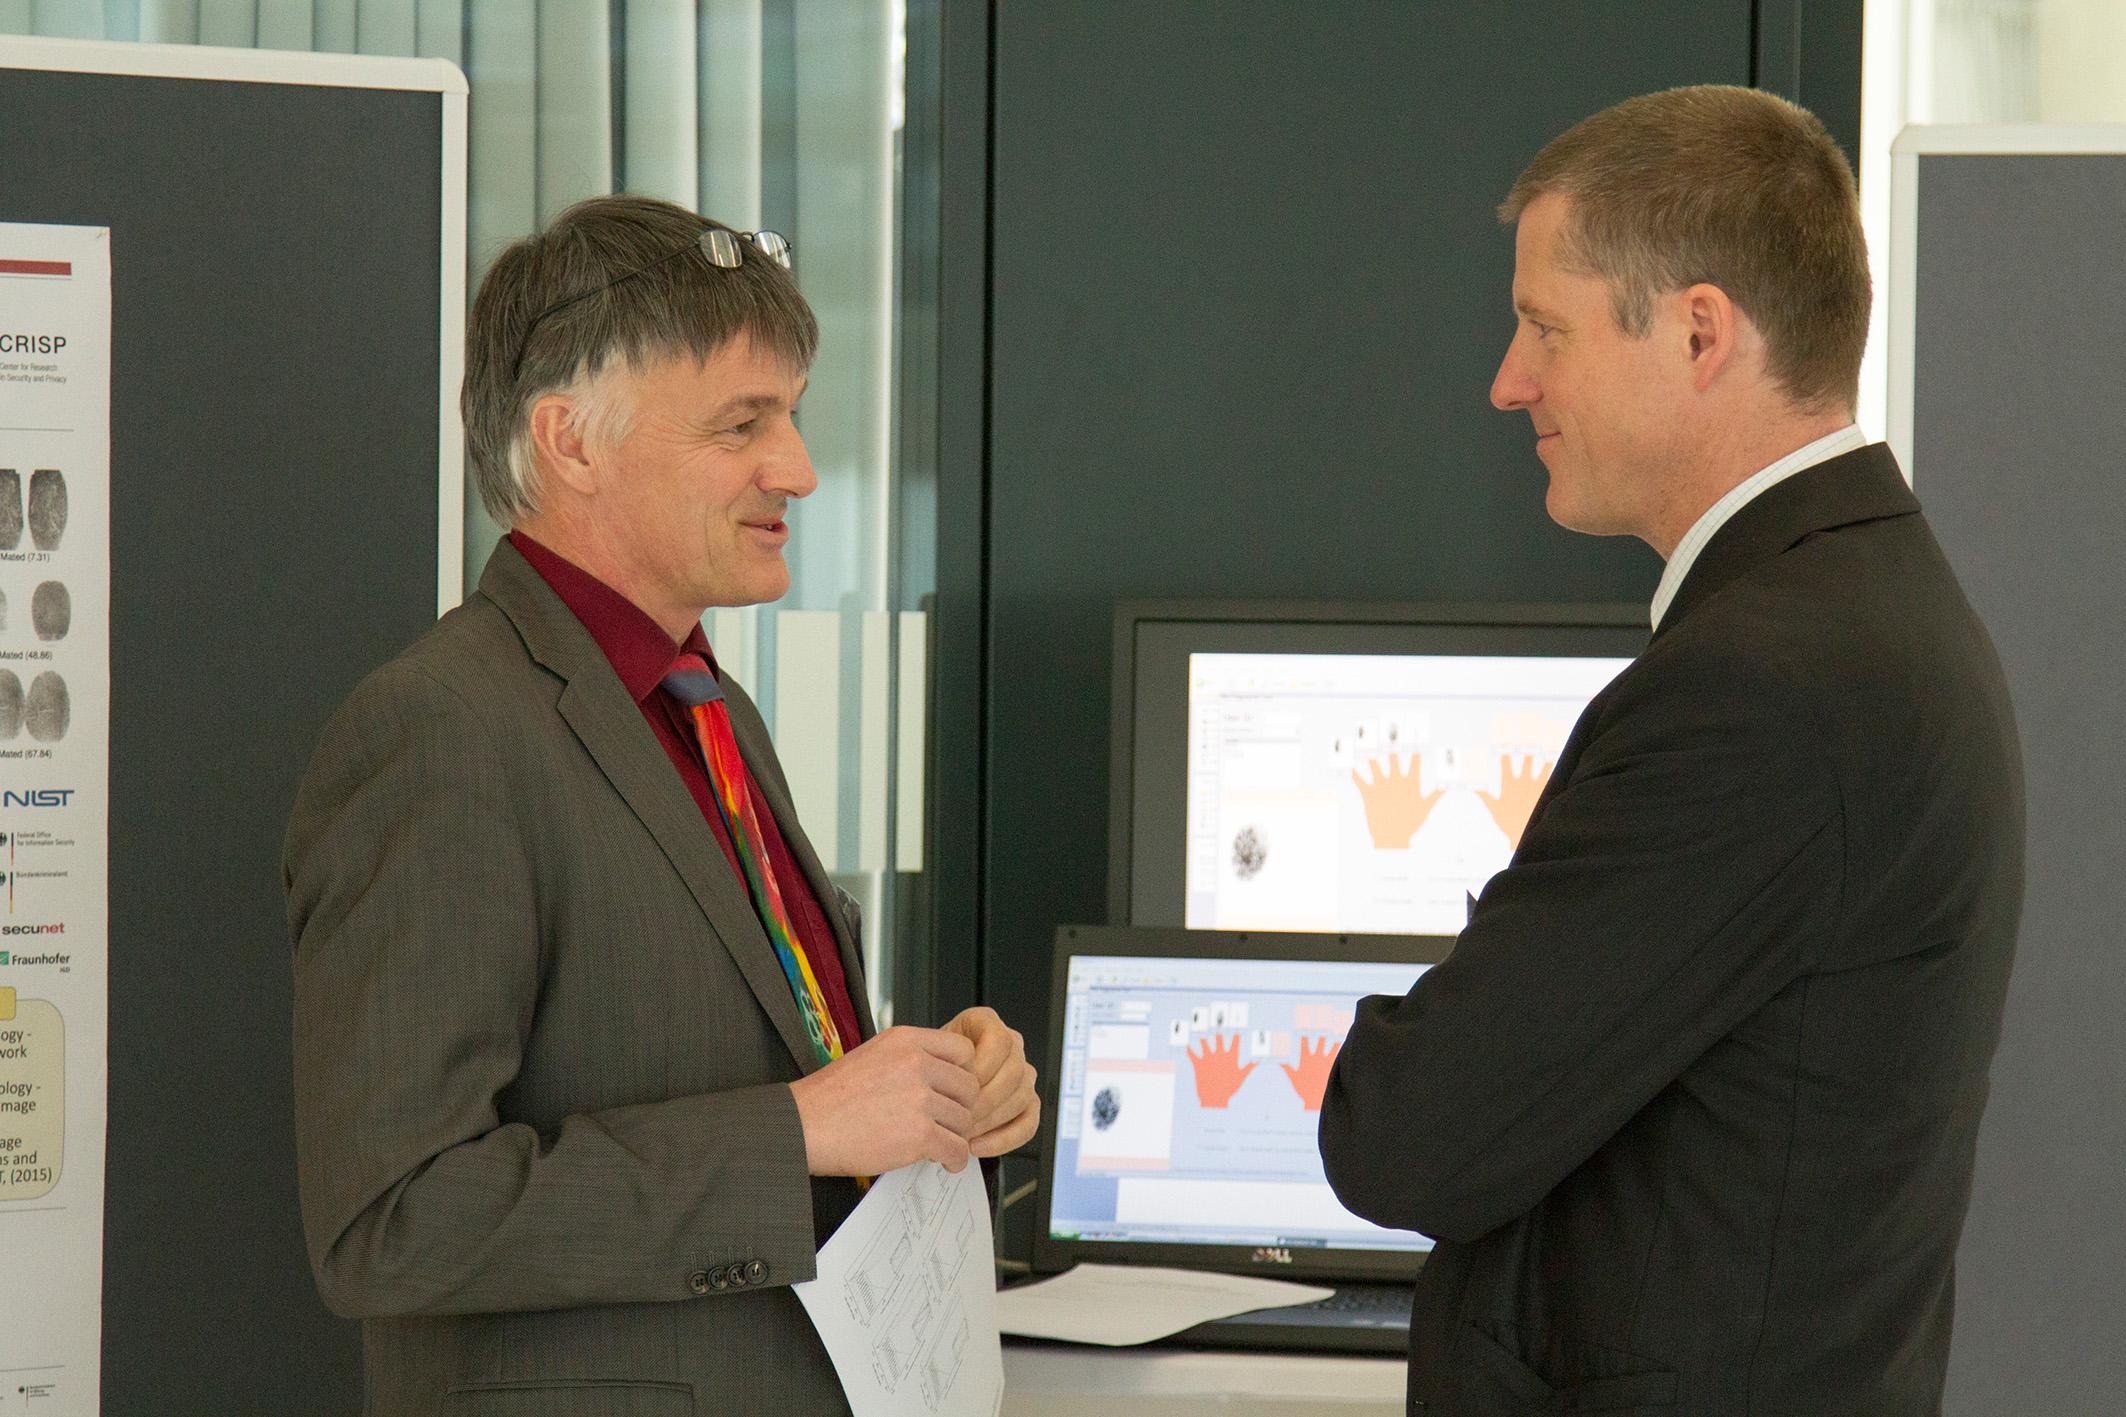 Prof. Busch and Prof. Baier